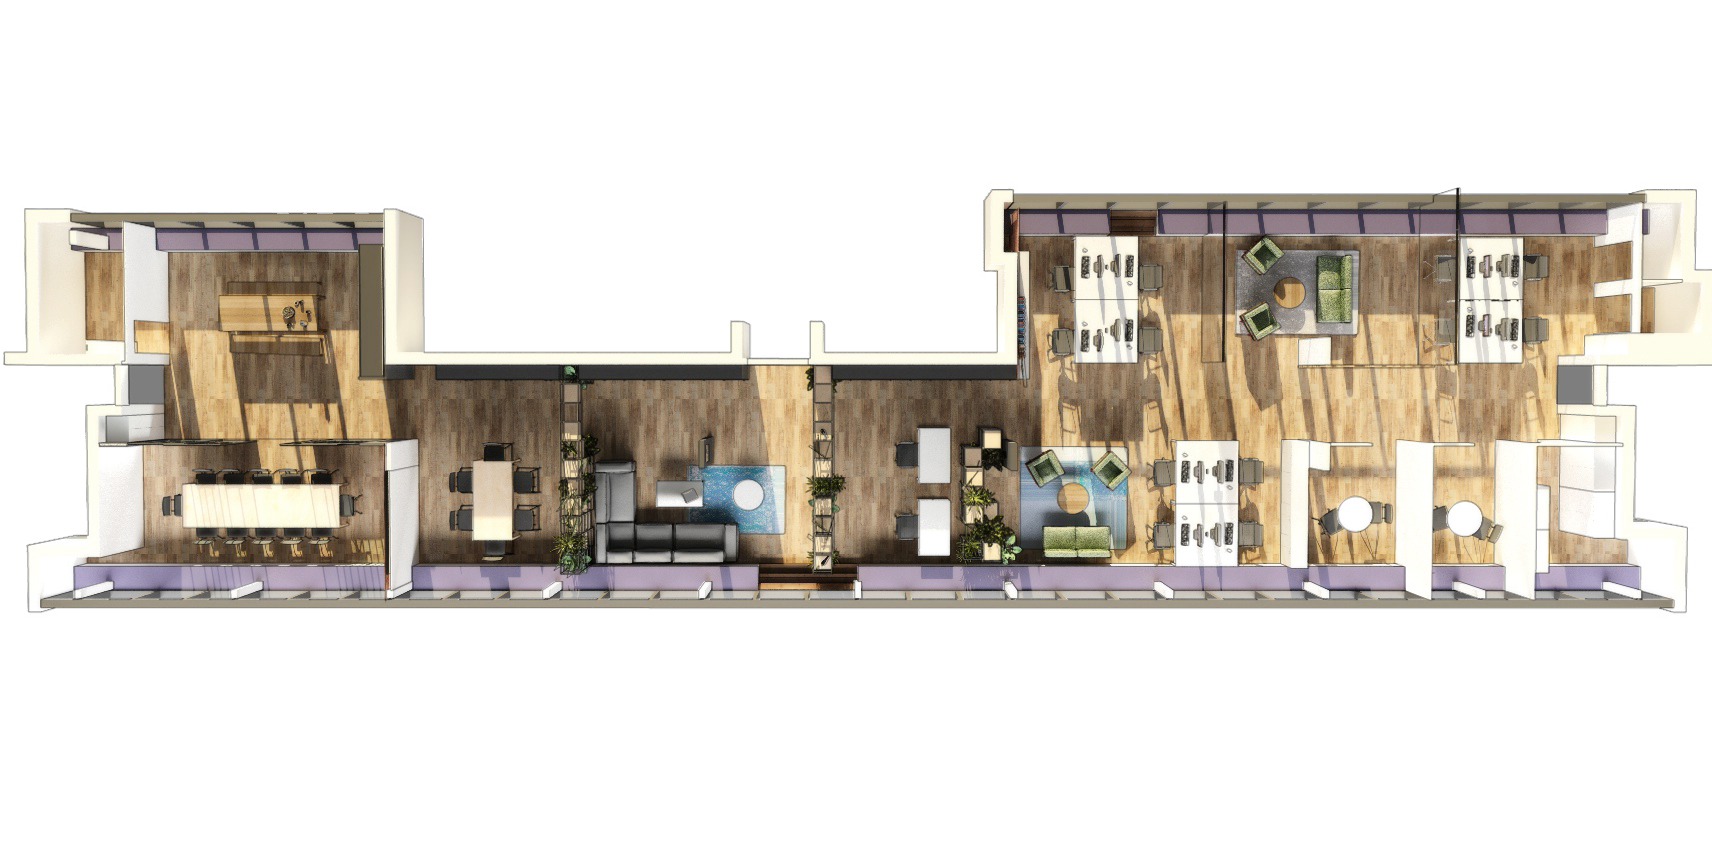 adv studio - nicolas vade - architecture interieur -lagardere 5.jpg